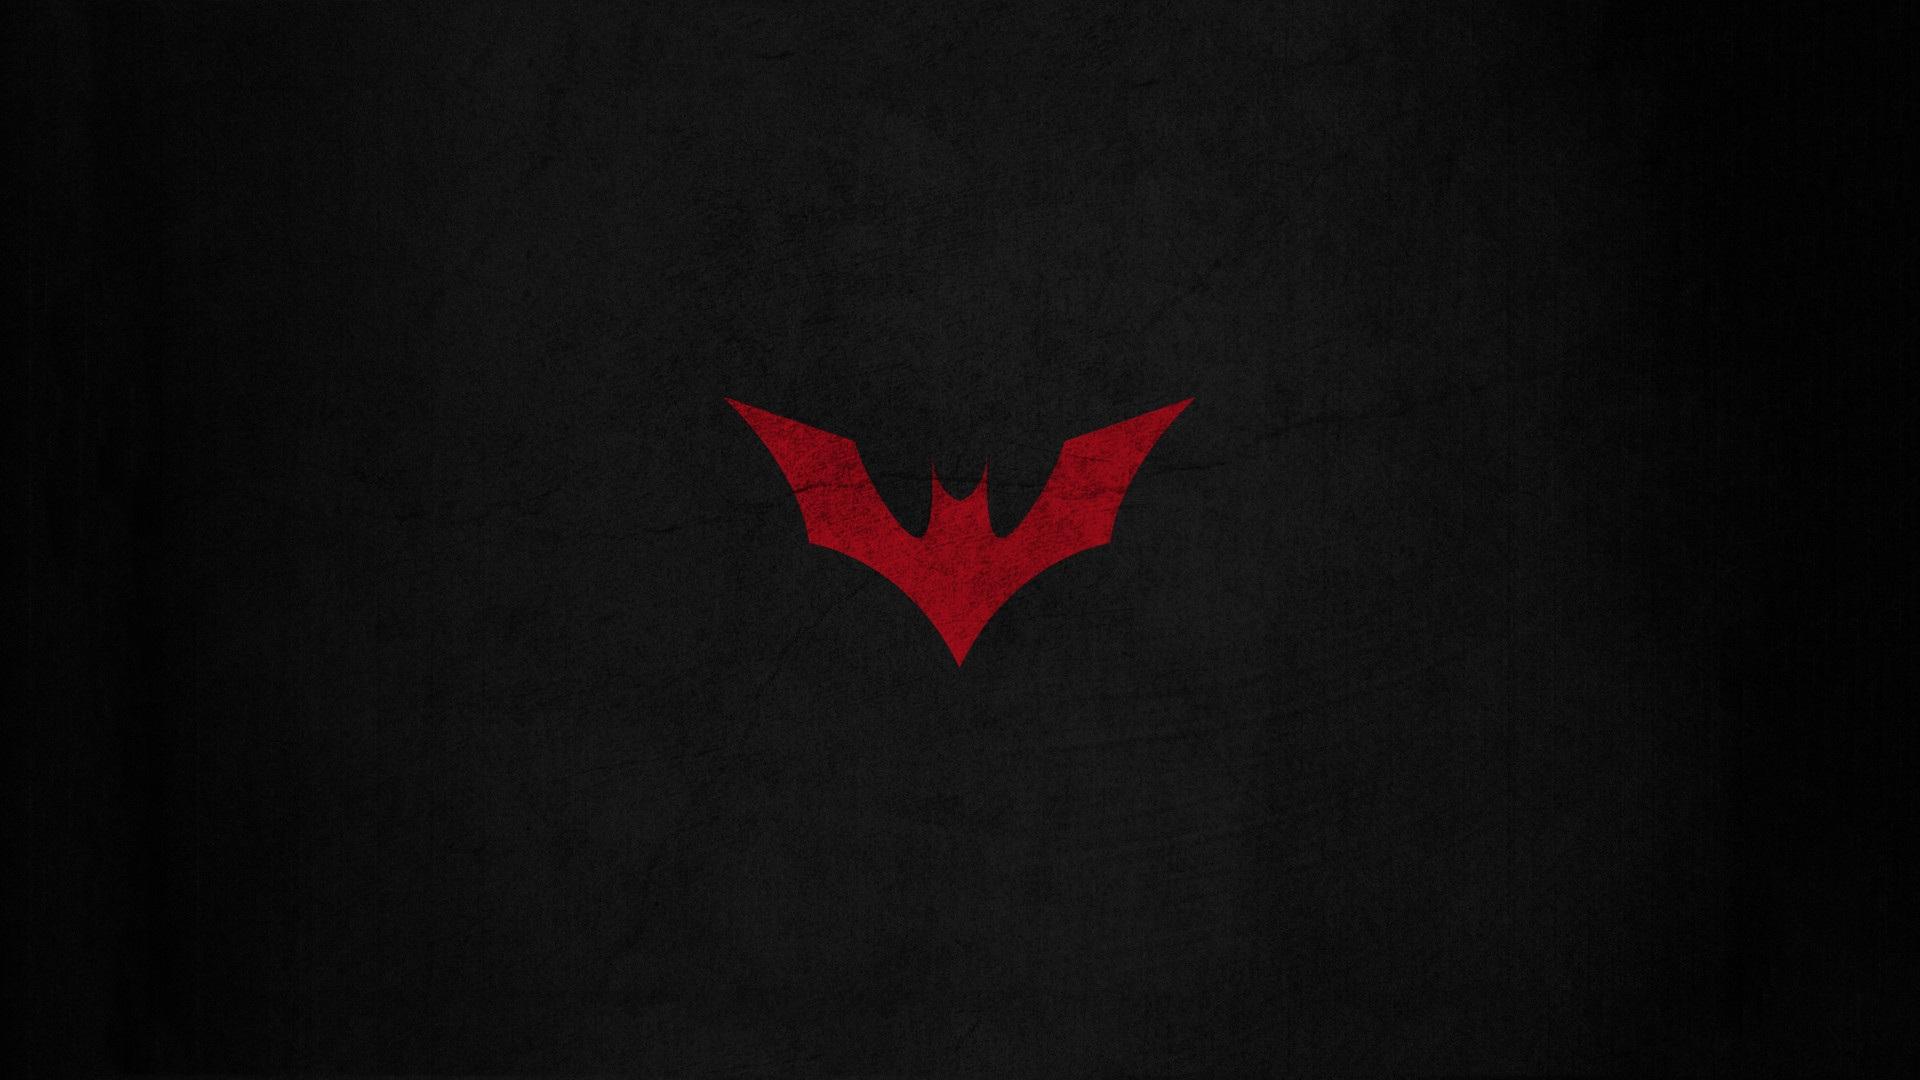 Batman beyond hd wallpapers 1080p 8953356 ilug calfo batman beyond hd wallpapers 1080p voltagebd Image collections